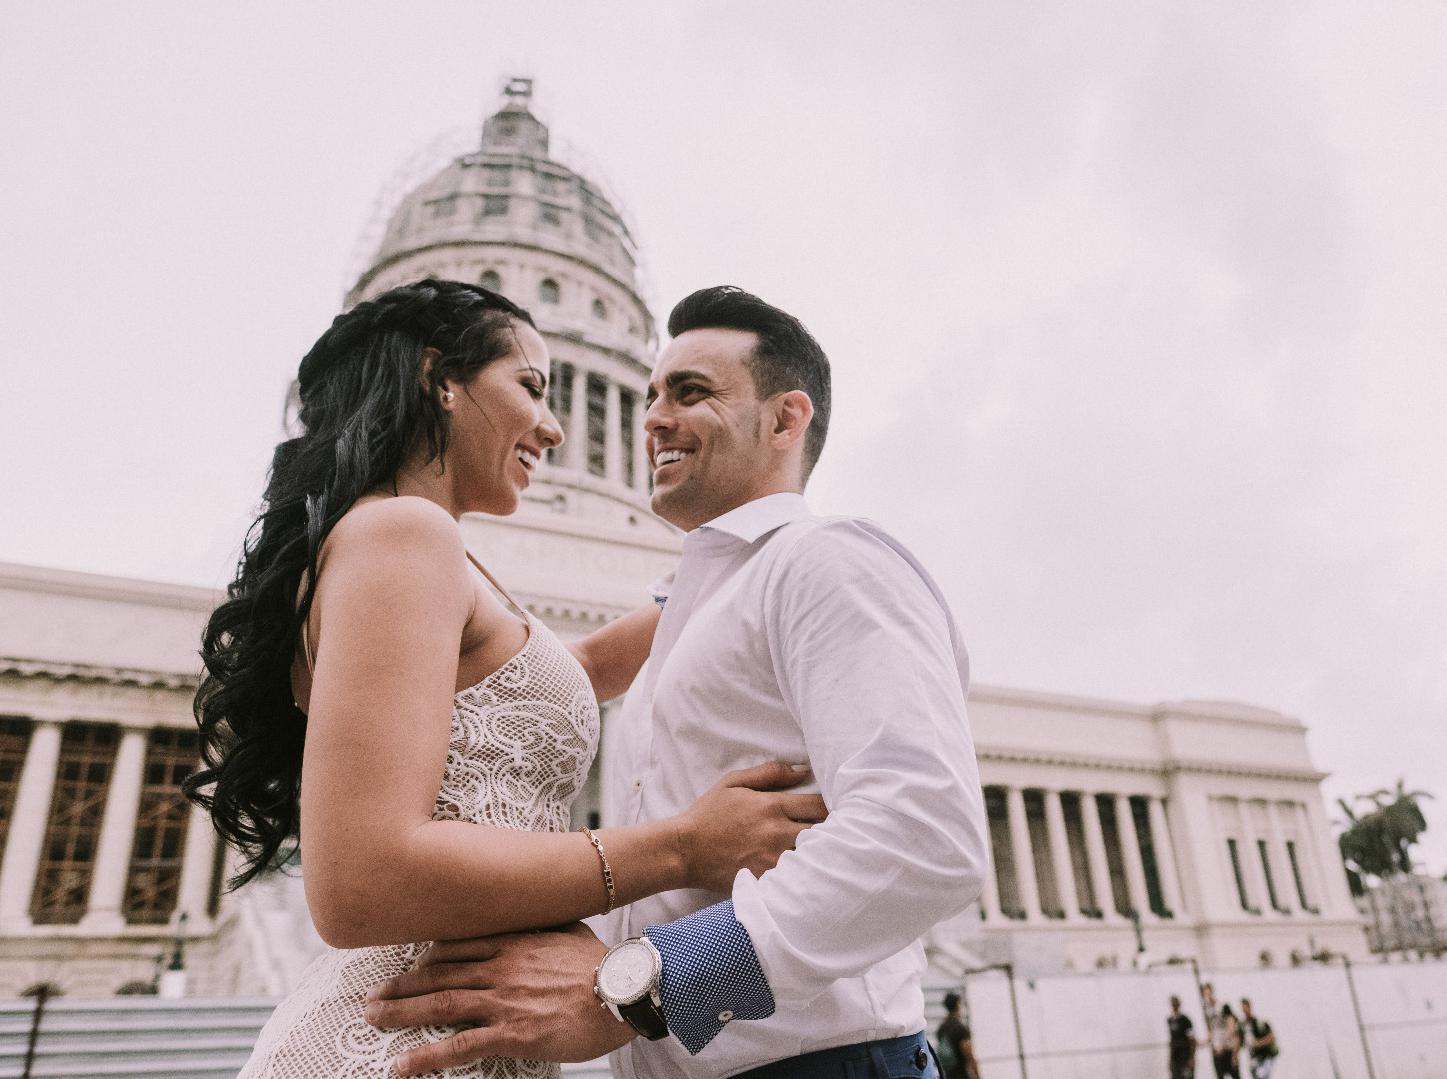 bodas-sin-clasificar-sin-tema-cuba-35131.jpg